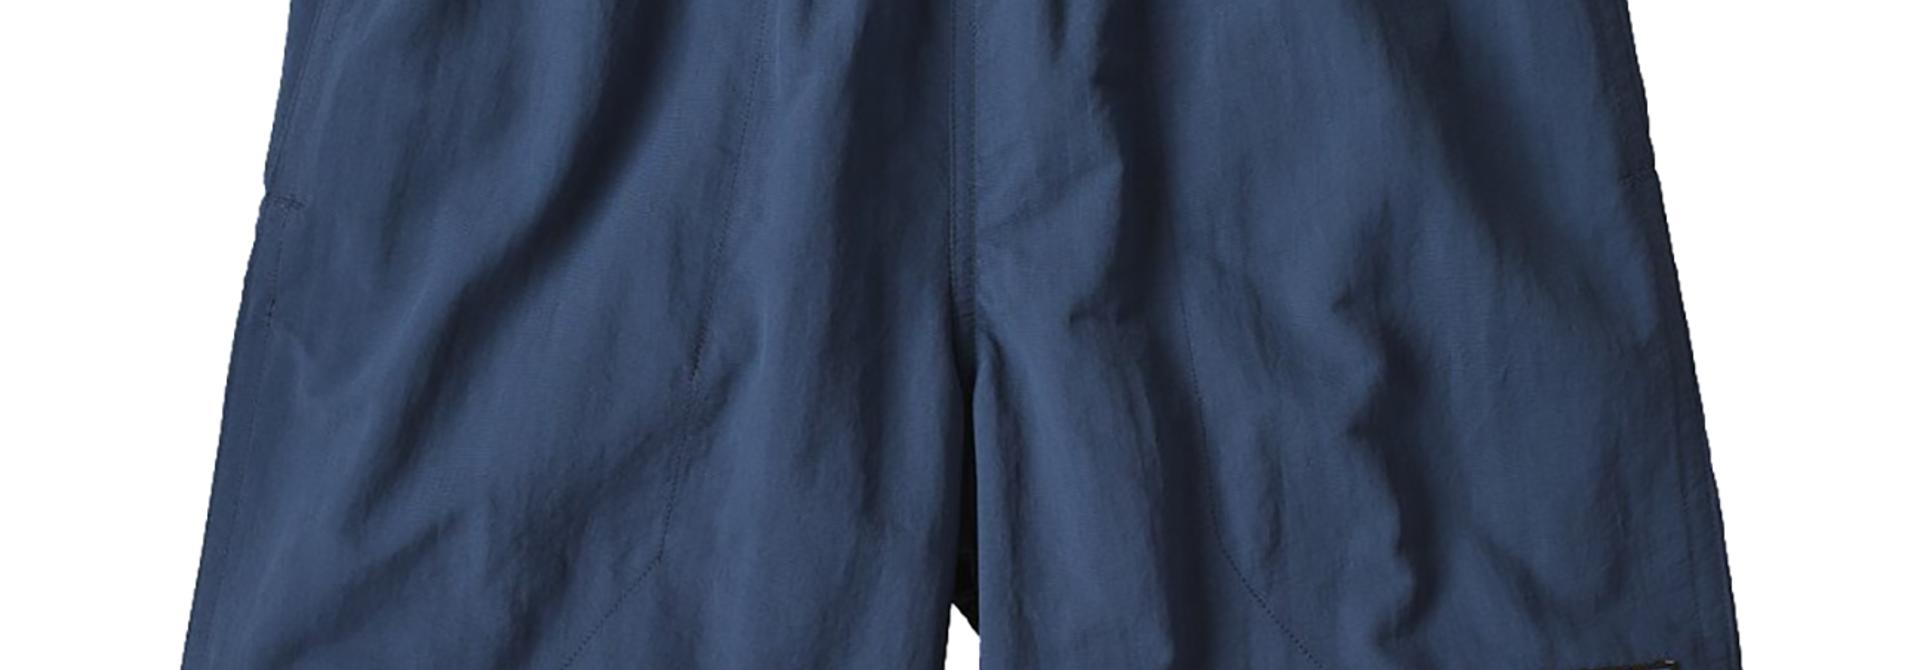 "Men's Baggies Shorts - 5"" Stone Blue"